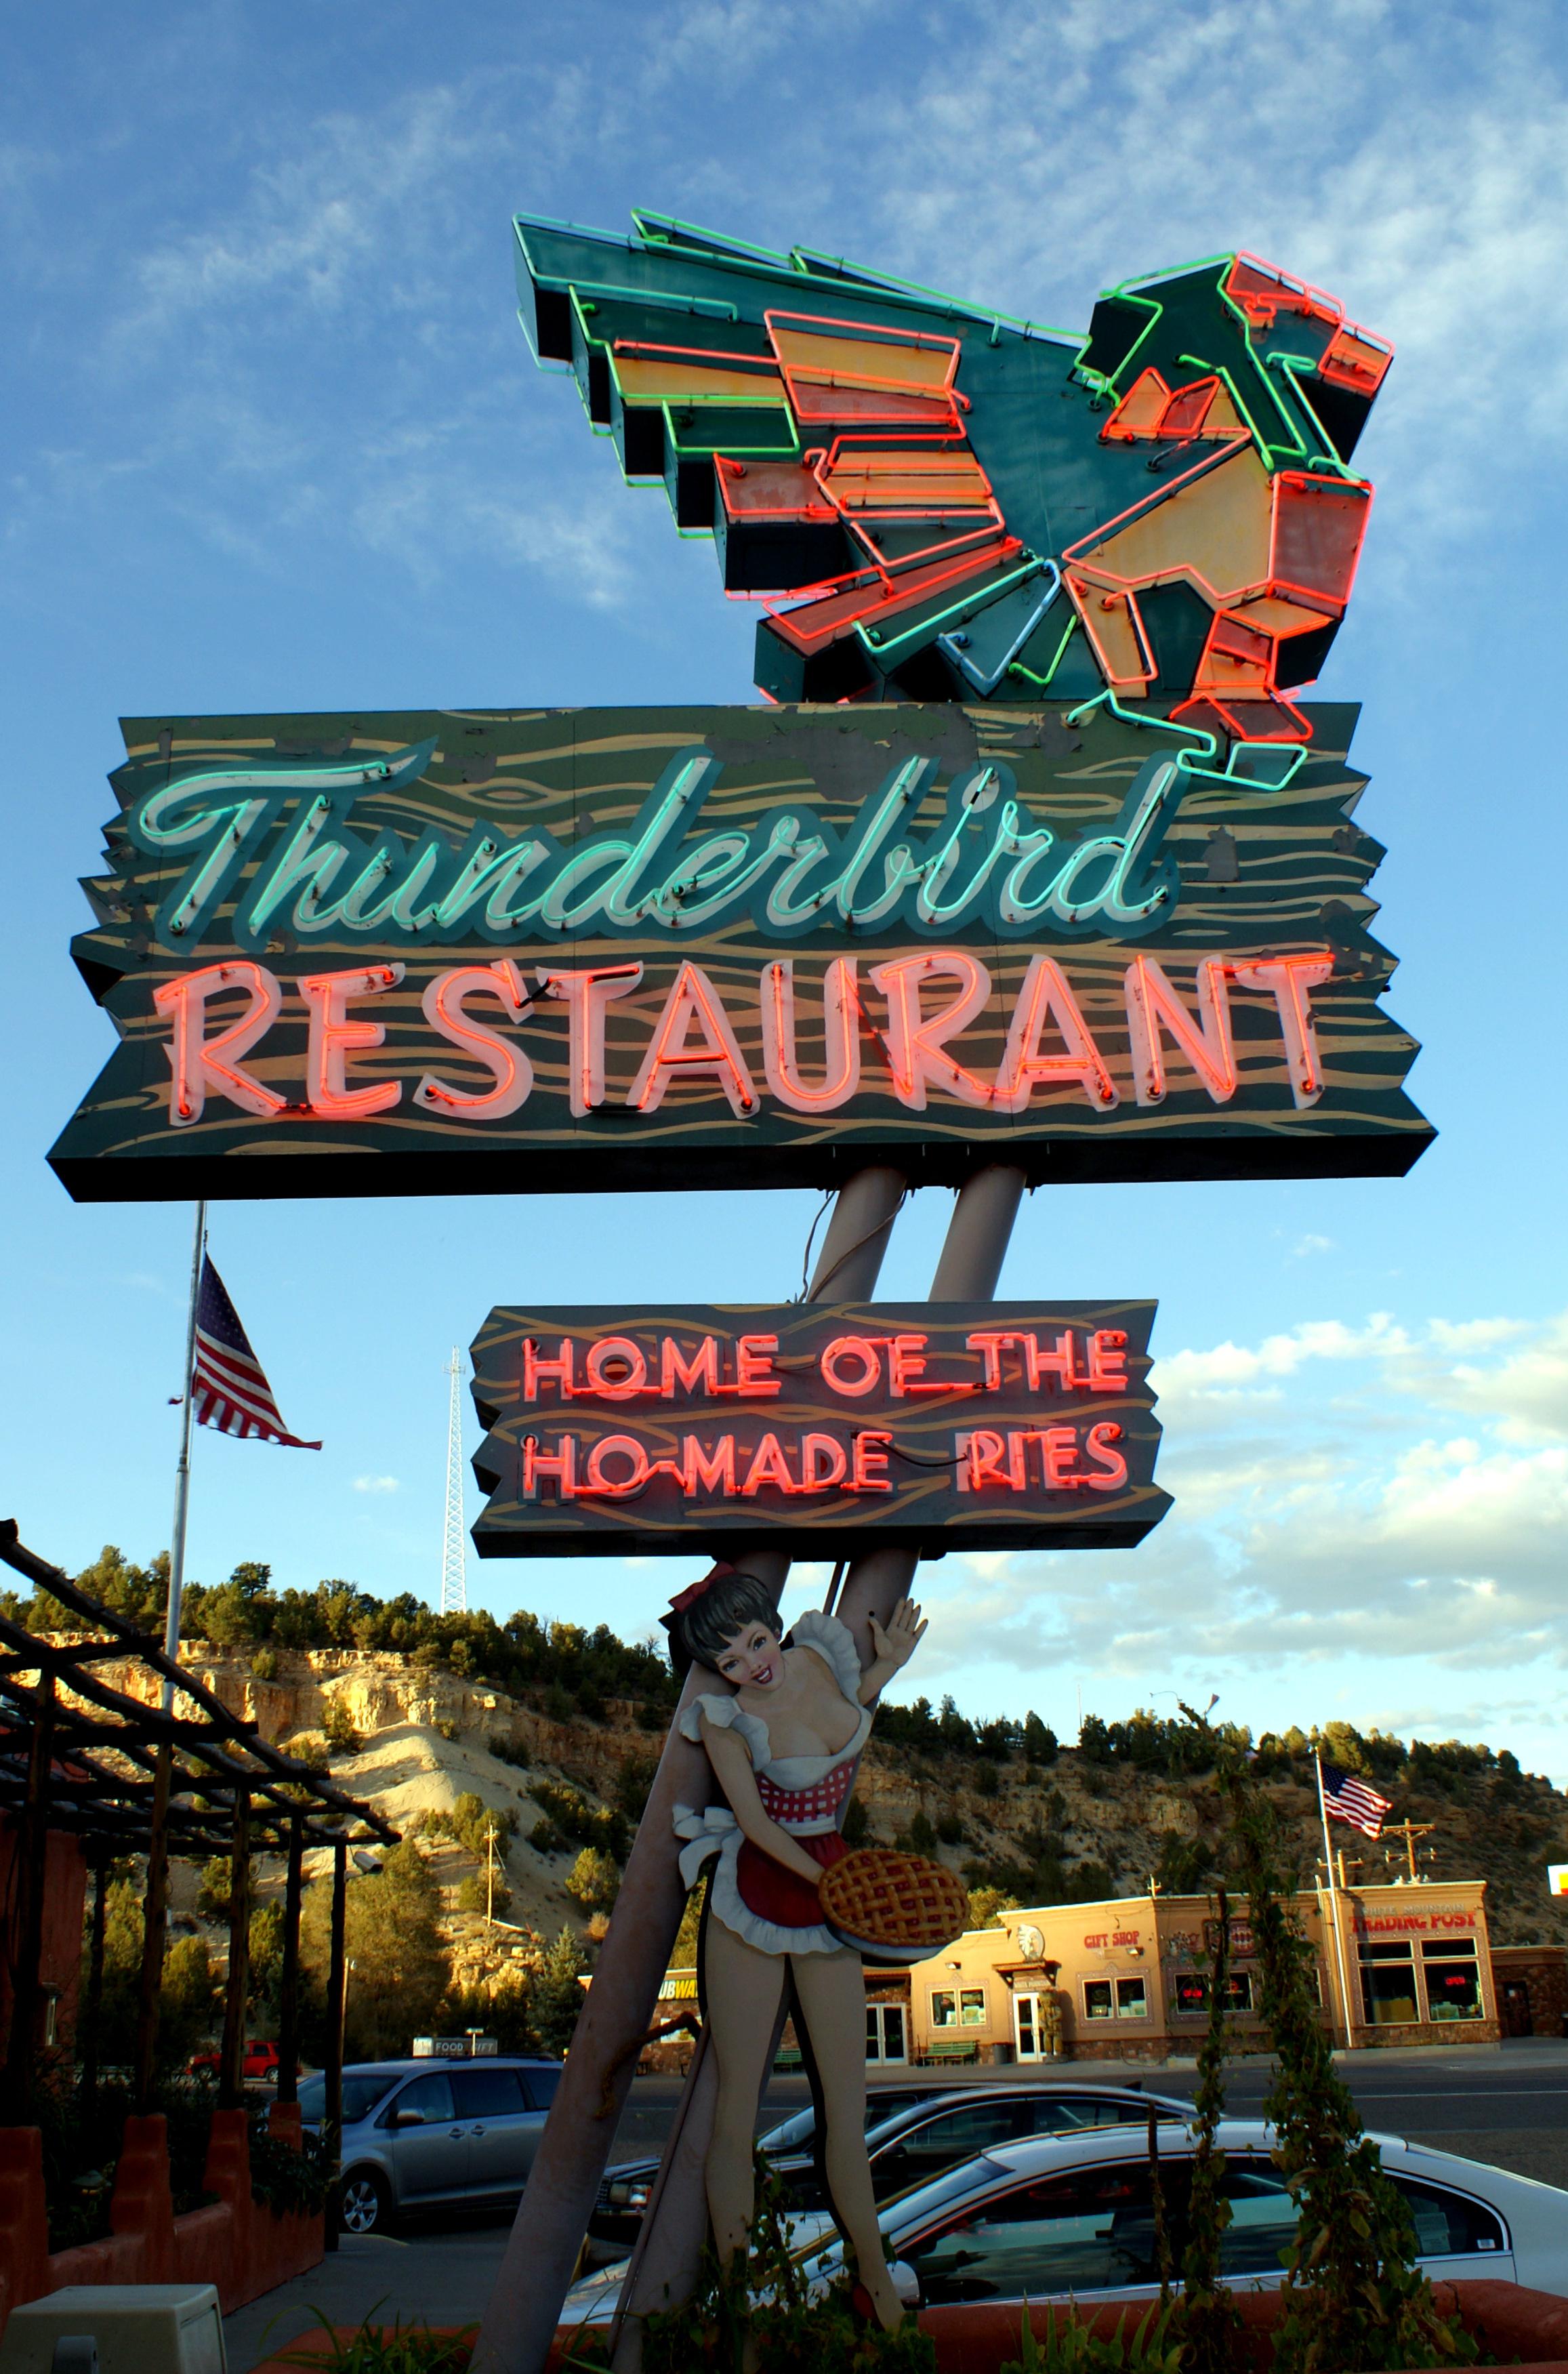 Thunderbird Restaurant - Junction U.S. Route 89 & Utah State Route 9, Mount Carmel, Utah U.S.A. - October 10, 2012